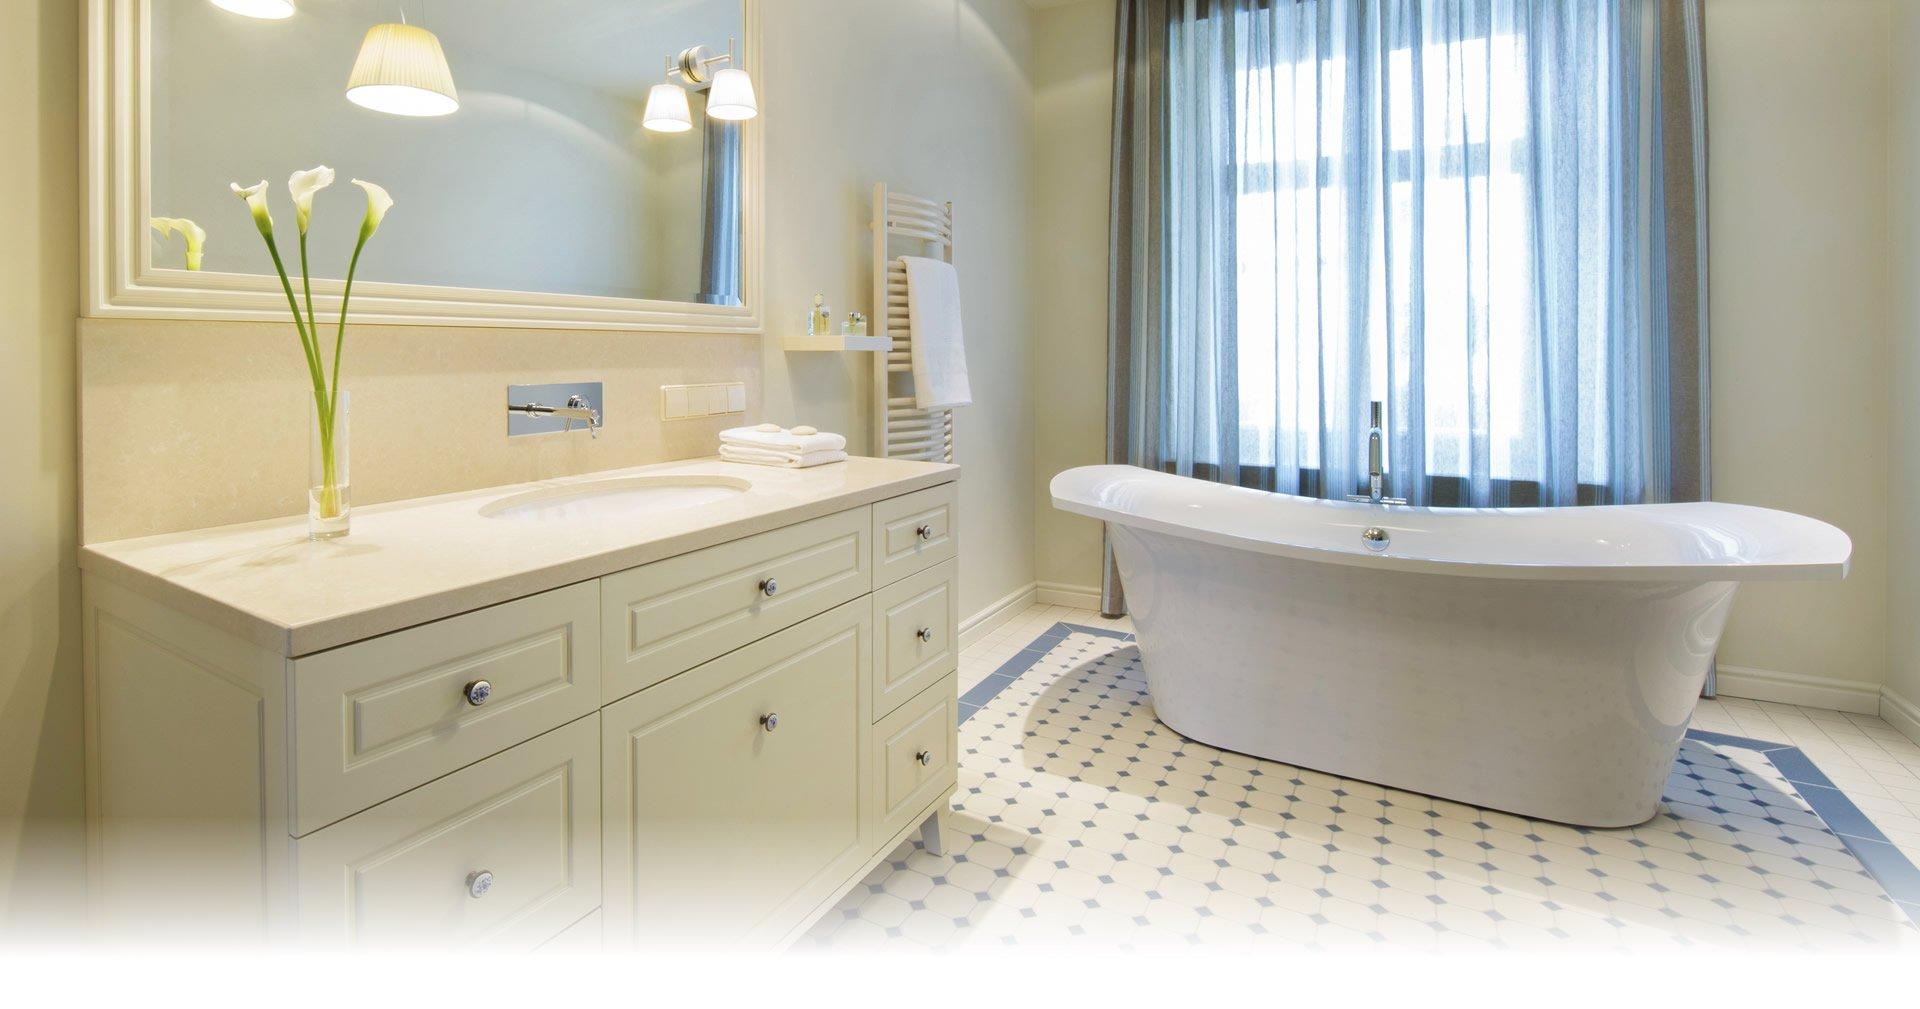 slide-bathroom-remodeling-vancouver-wa